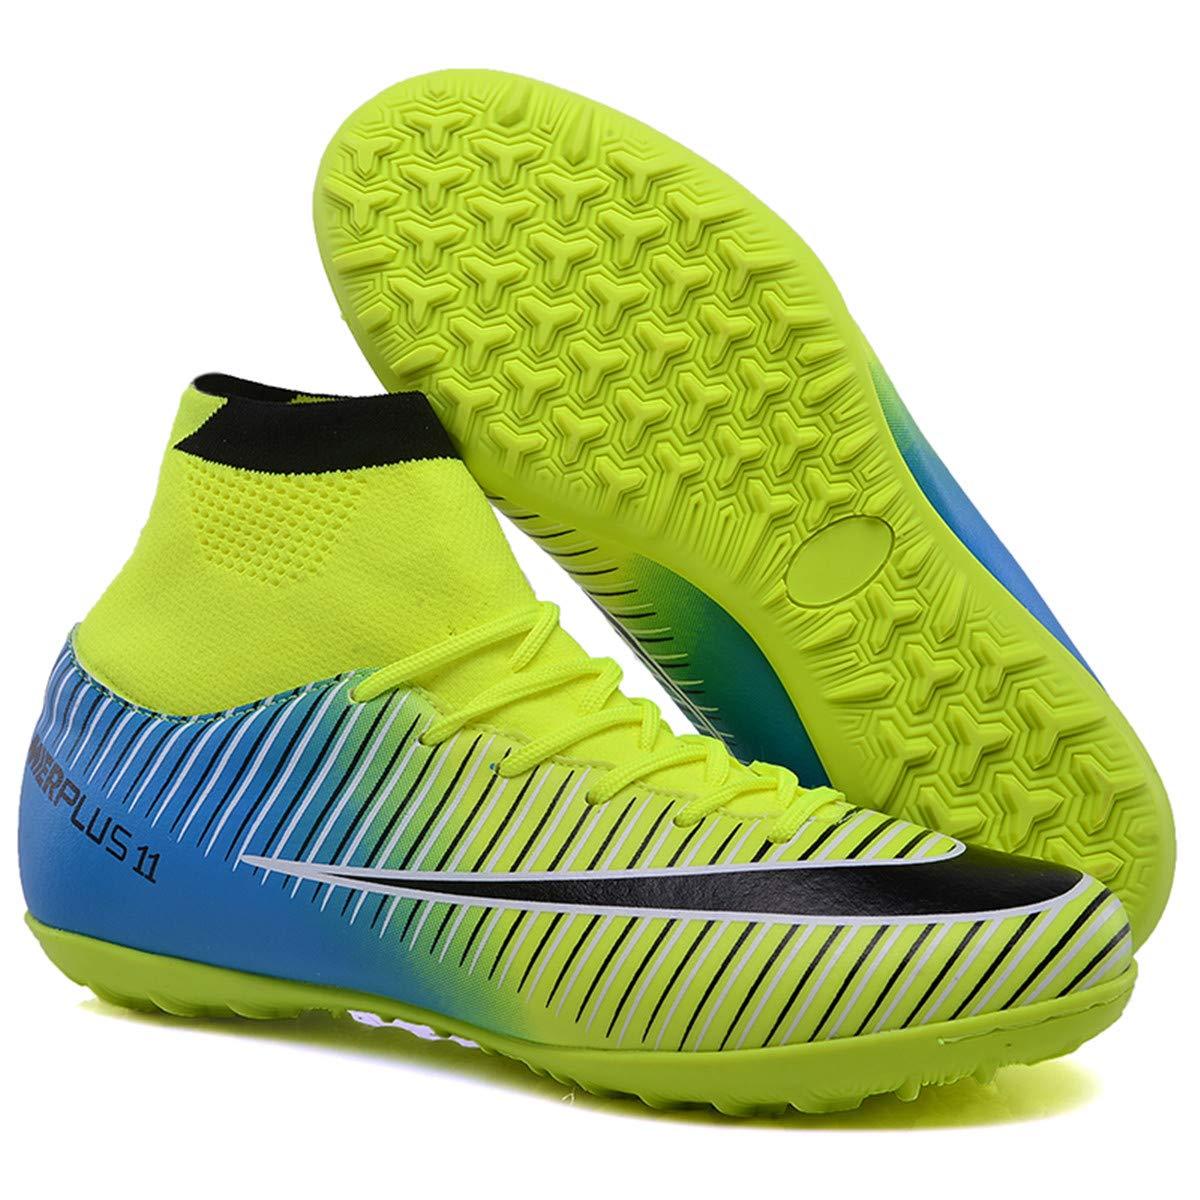 3b22524086892 LSGEGO Botas de fútbol para Hombres Zapatos de fútbol con Tacones ...